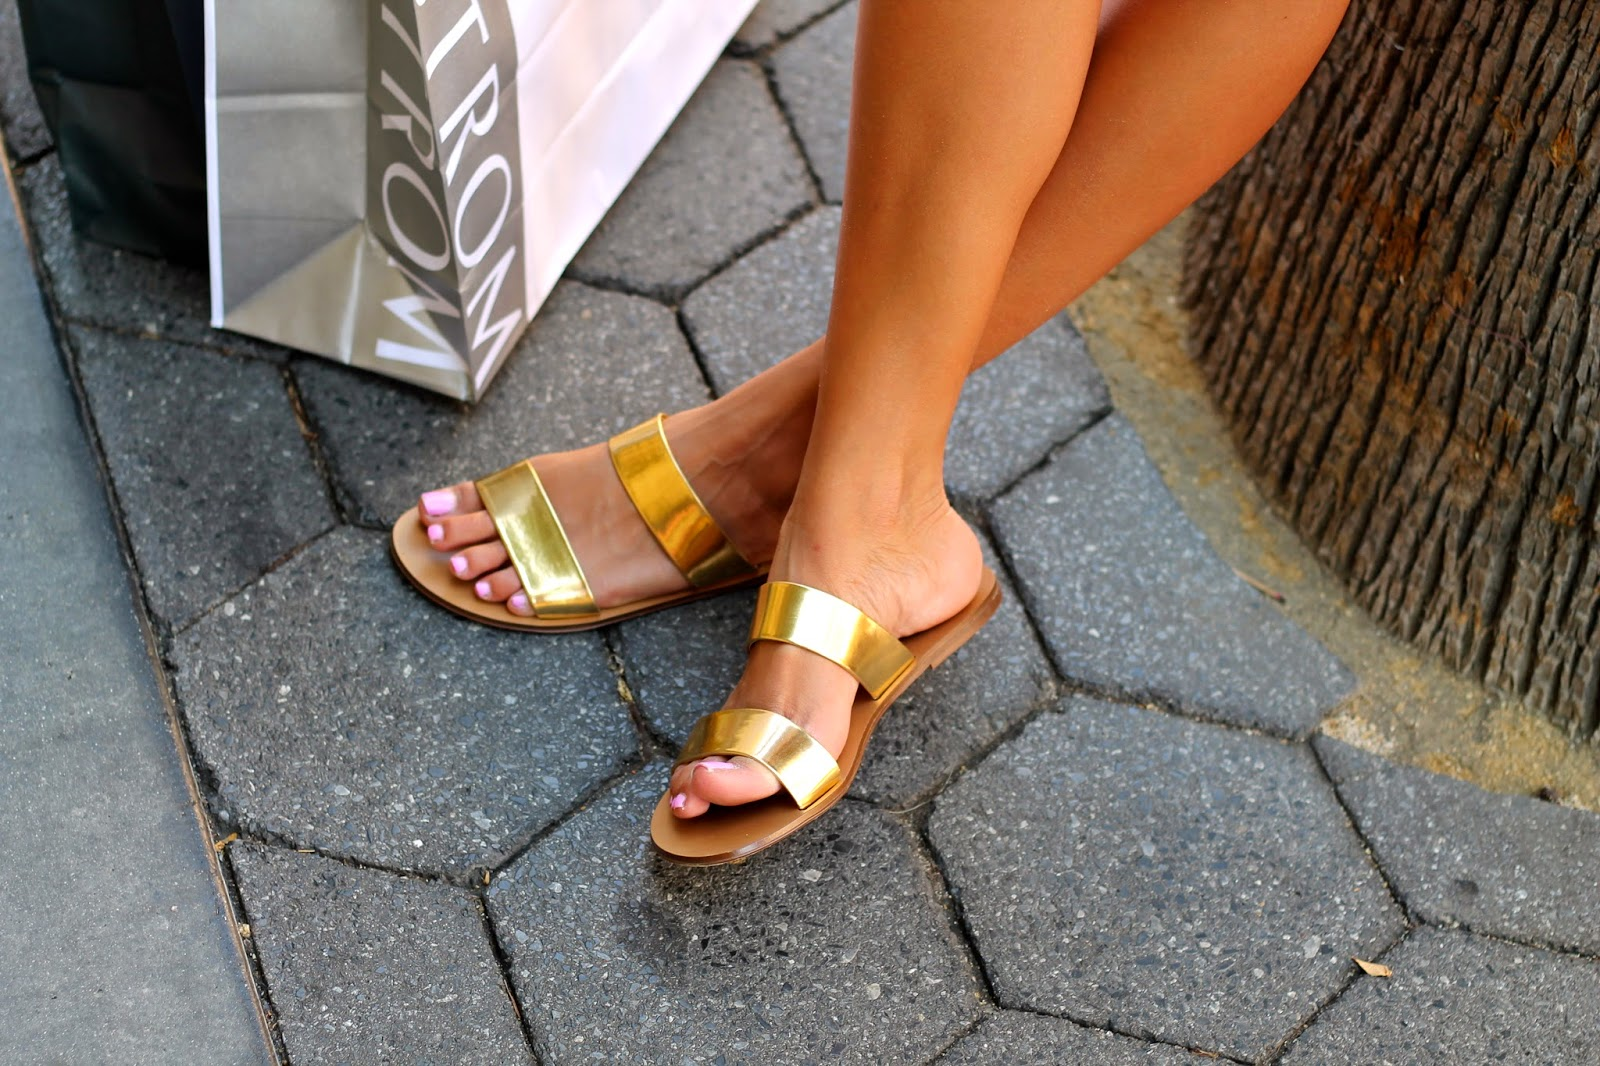 j crew sandals, slides, gold sandals, how to wear slides, summer outfit